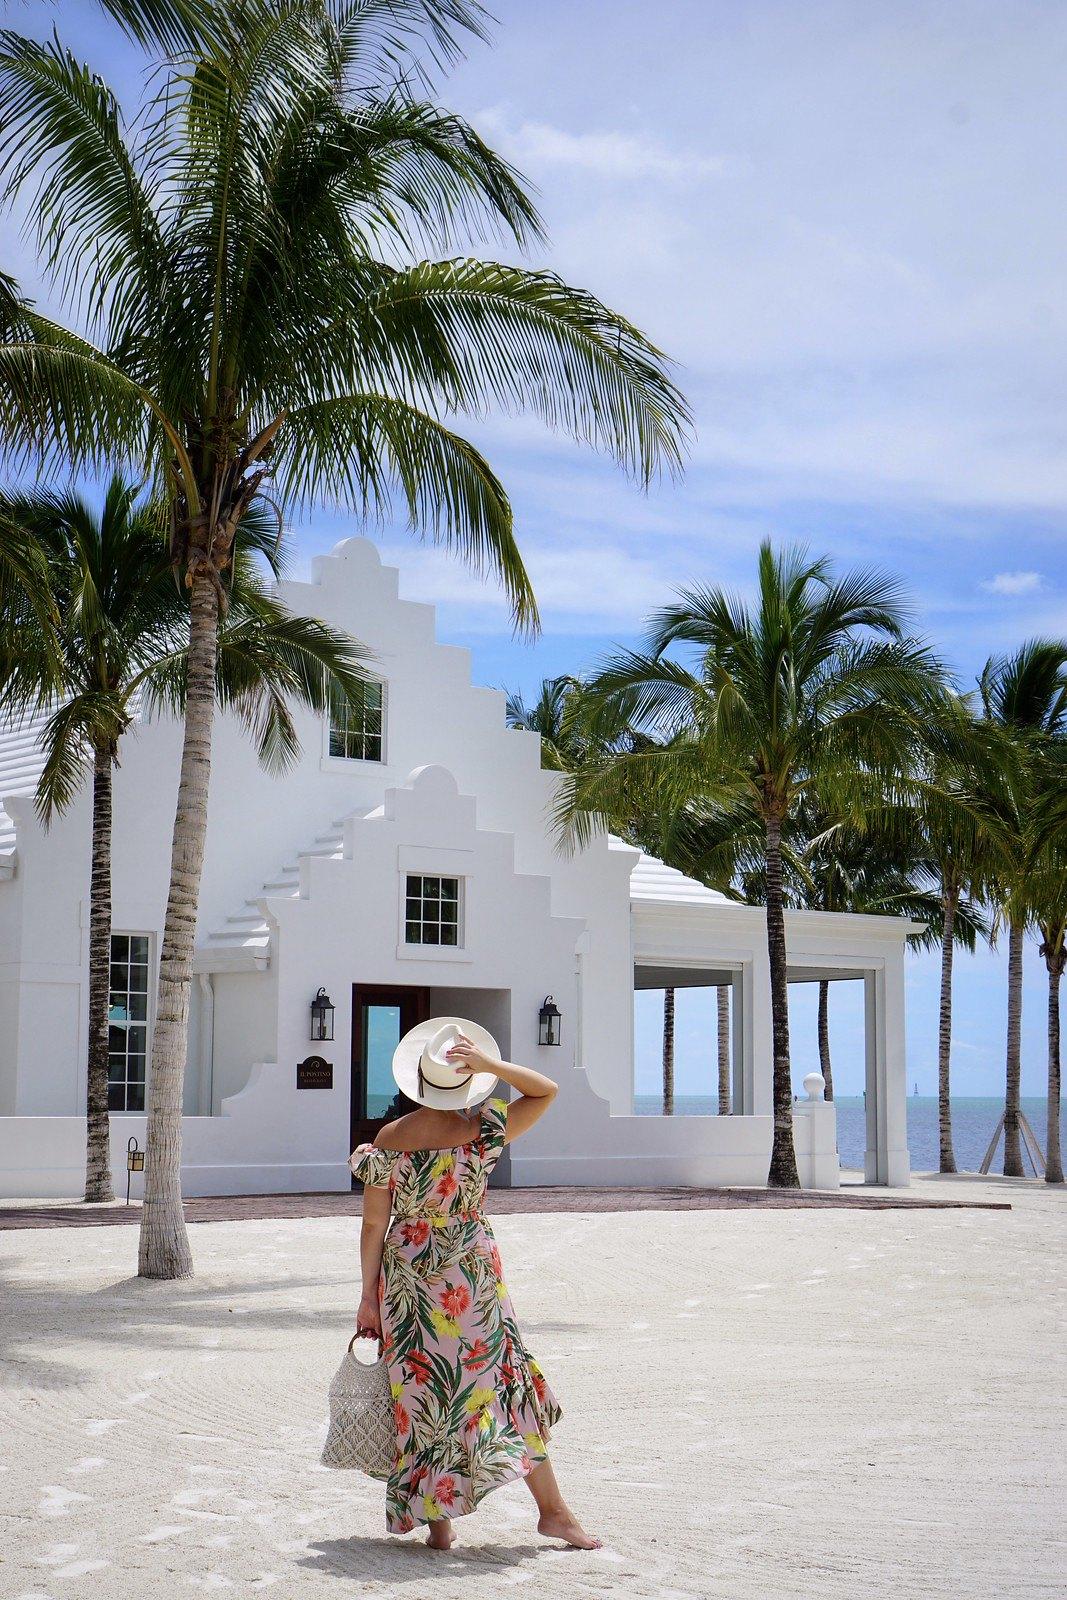 Florida Keys Travel | Islamorada Resort | Palm Print Summer Outfit